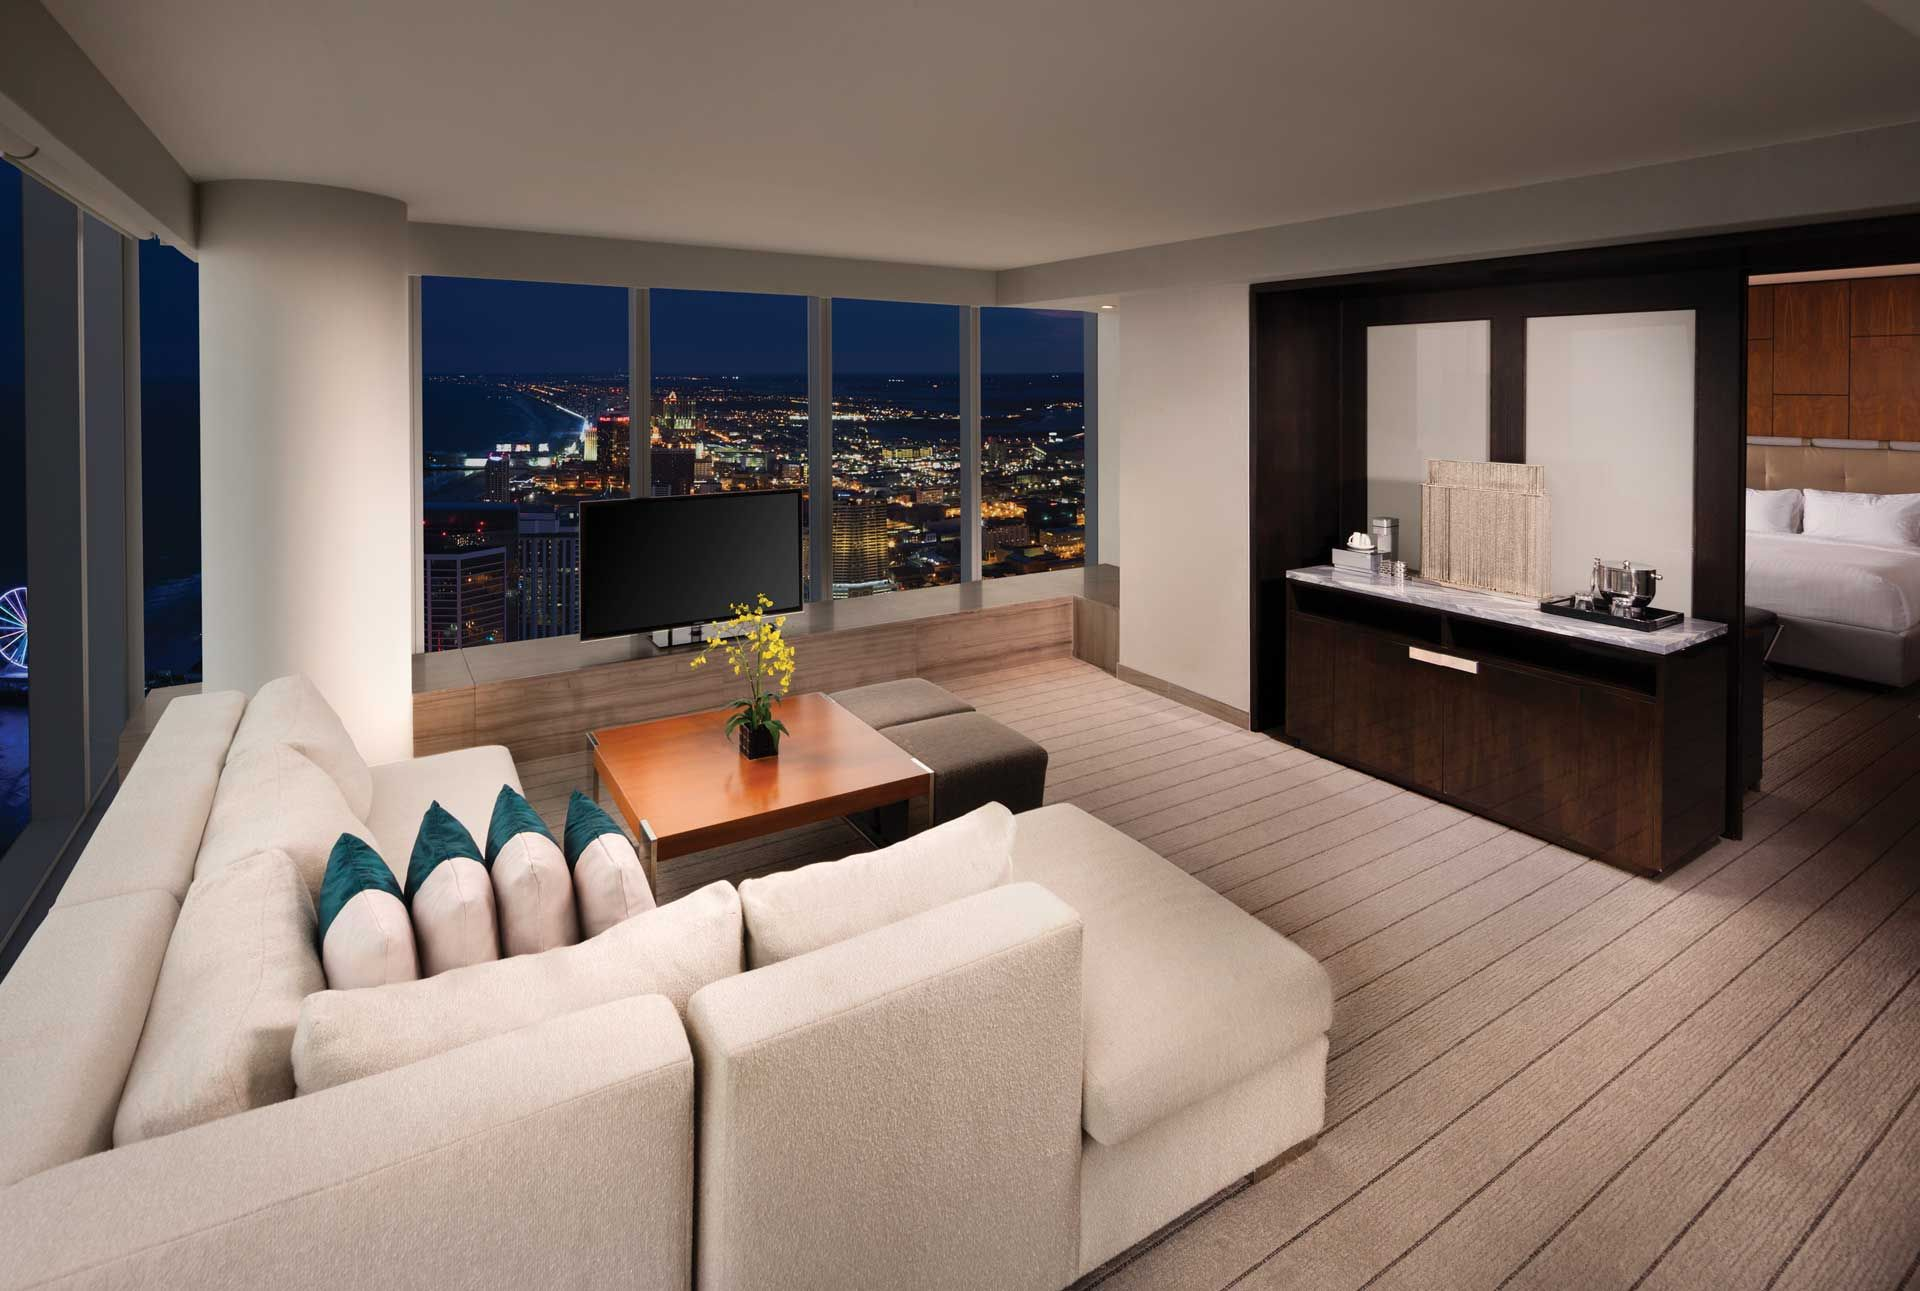 One Bedroom Suite With Images Bedroom Suite One Bedroom